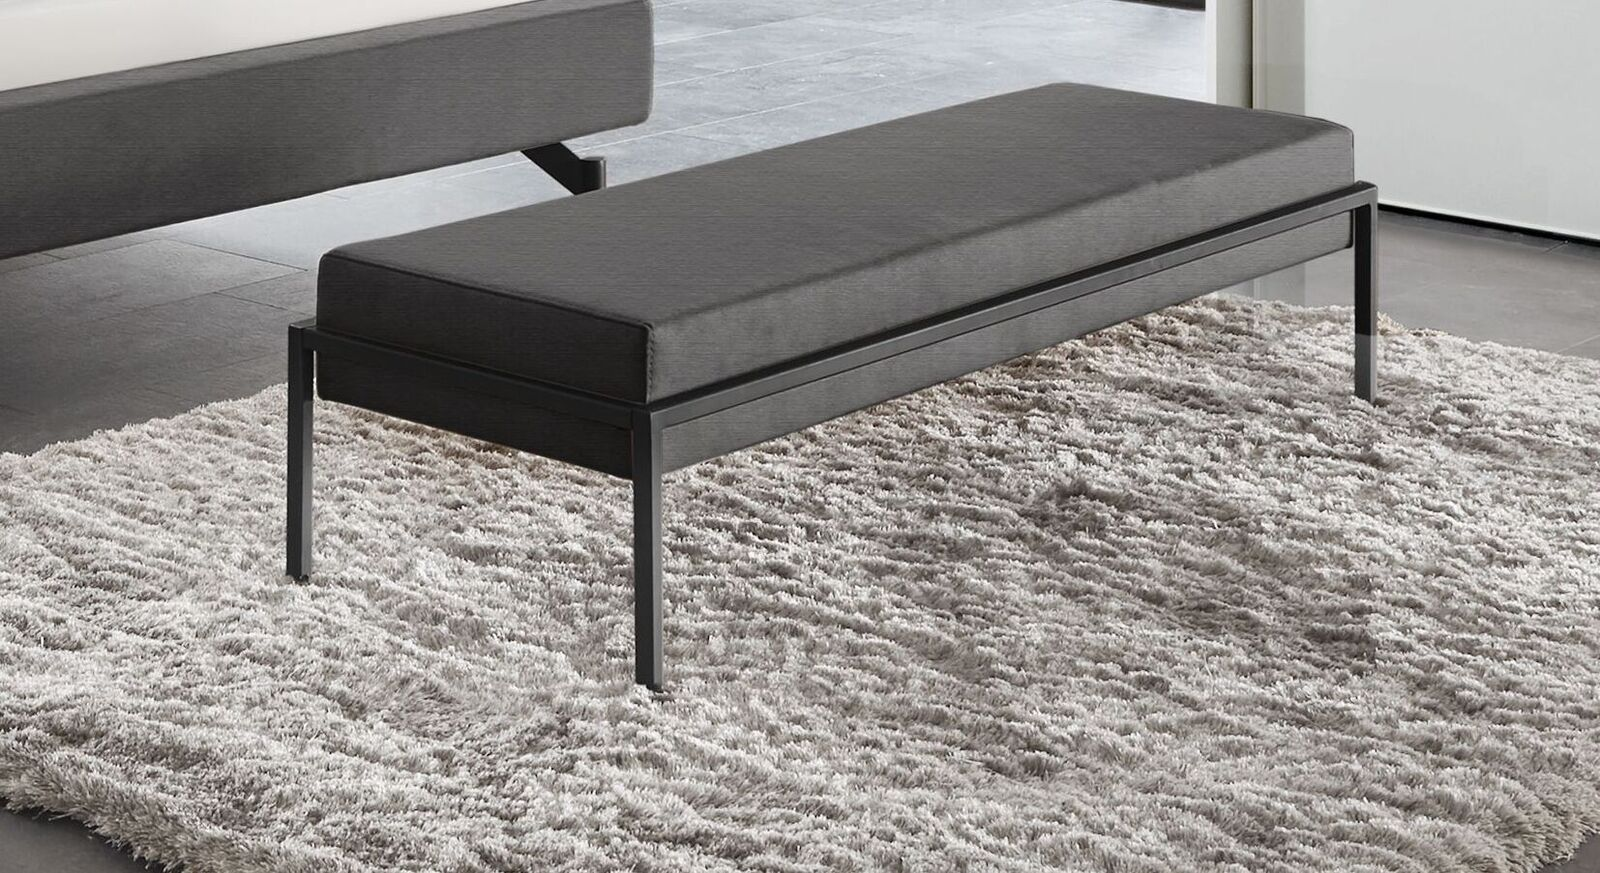 Bettbank Sotello mit anthrazitfarbenem Sitzpolster